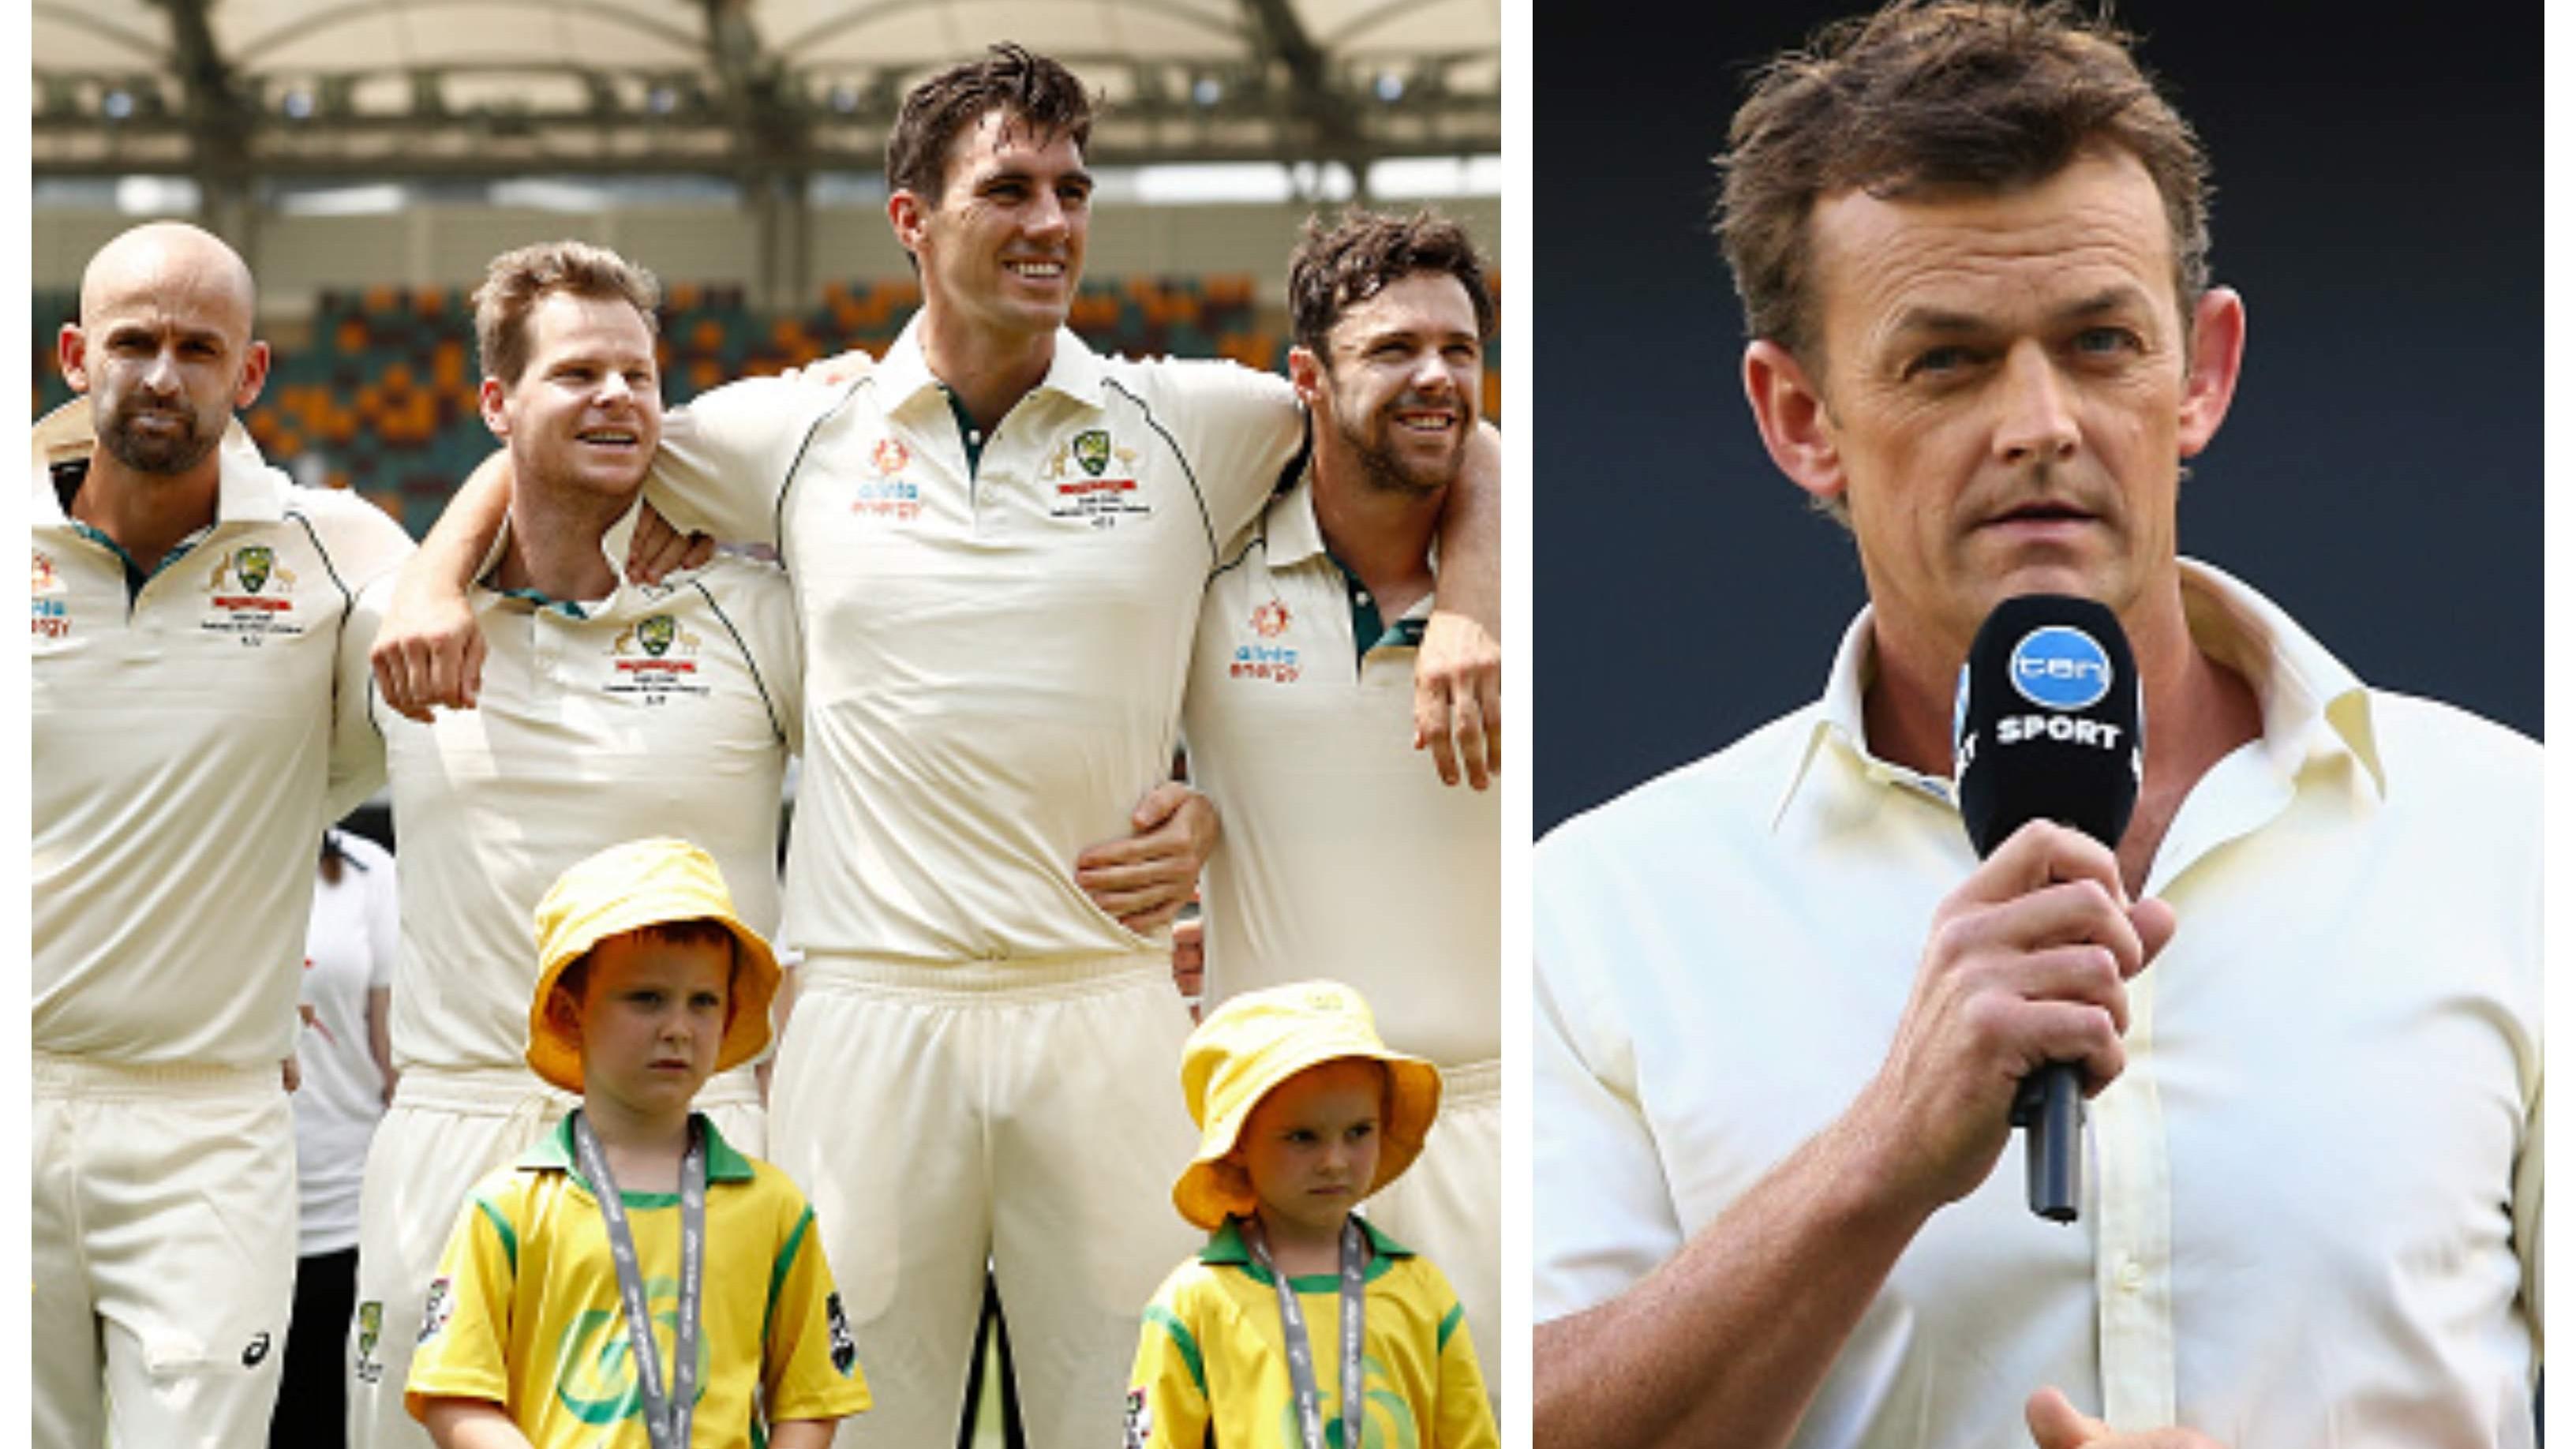 Adam Gilchrist names his pick for next Australia captain